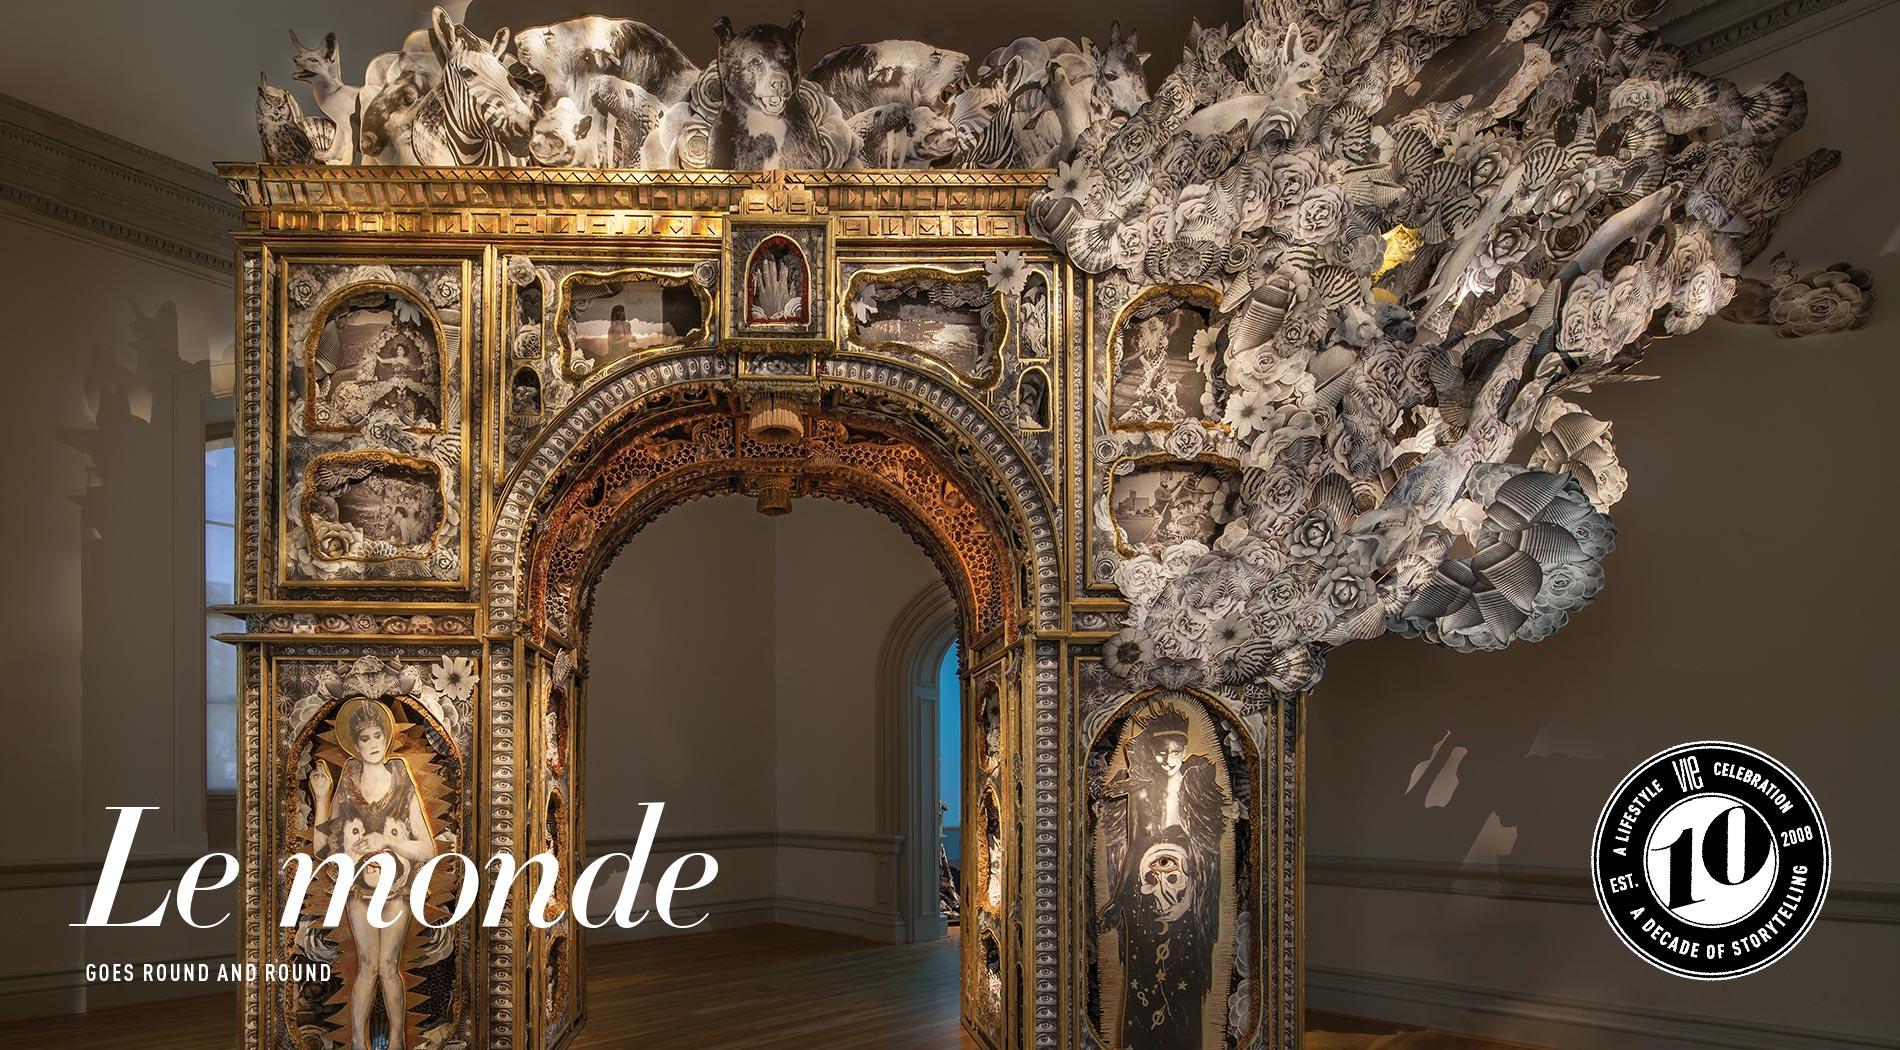 VIE Magazine - The Art & Culture Issue - October 2018 - Le Monde